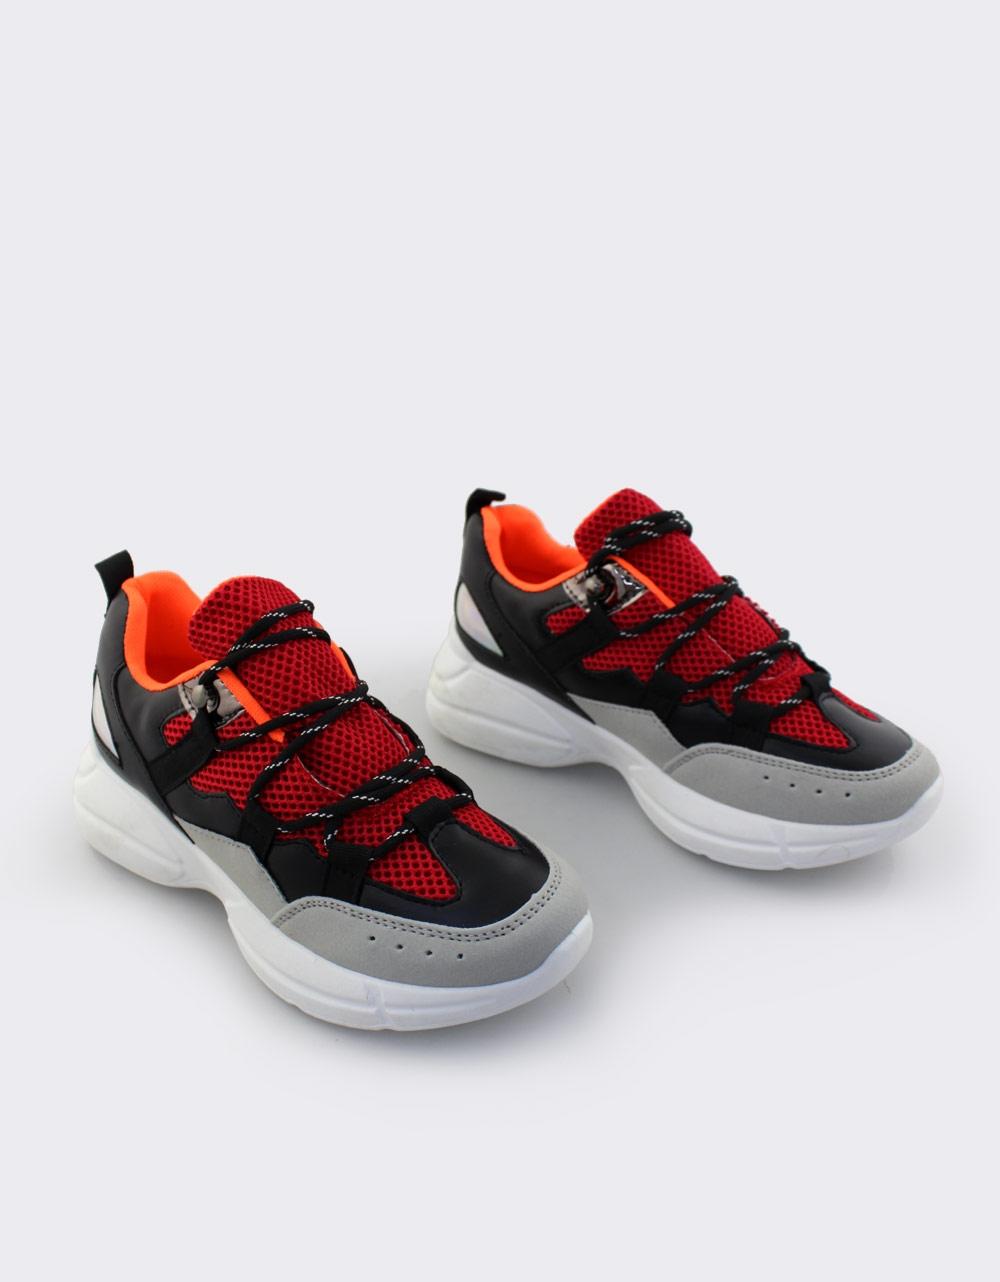 4b6a1b33b3b Inshoes.gr. Γυναικεία sneakers με ριγέ κορδόνια | Inshoes.gr Μαύρο